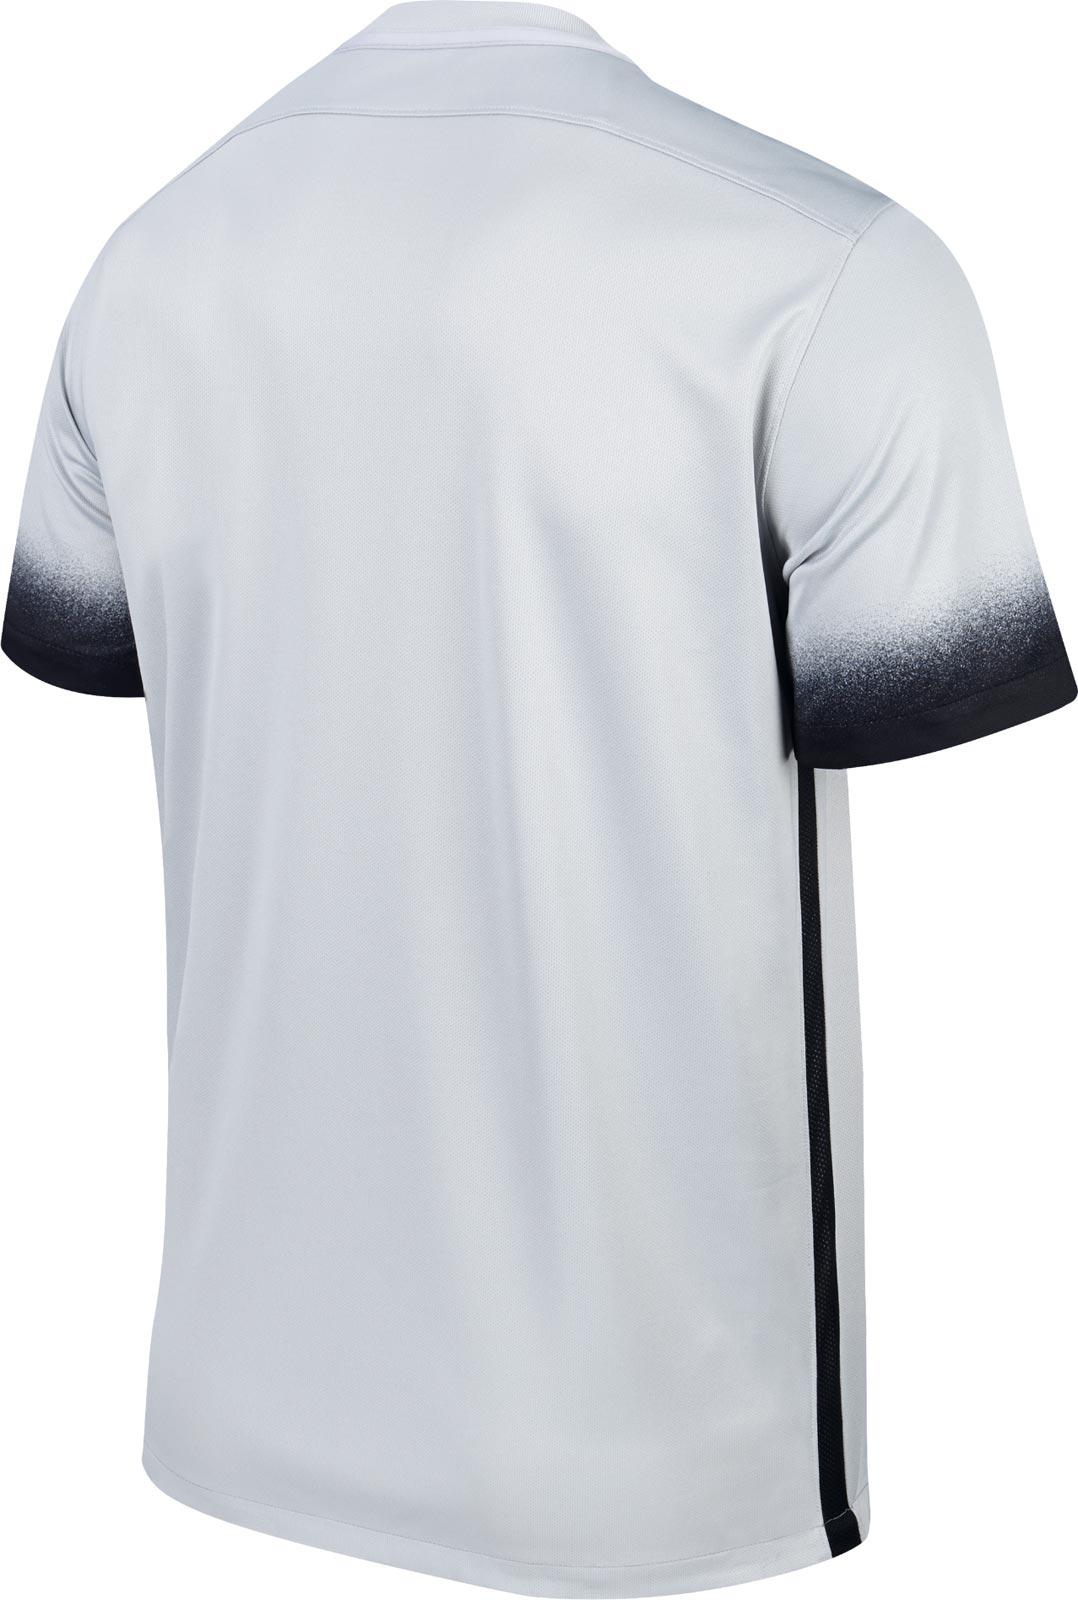 AS Roma 15-16 Nike Third Kit Jersey Shirt   Have a Nice Day ... ba883db56